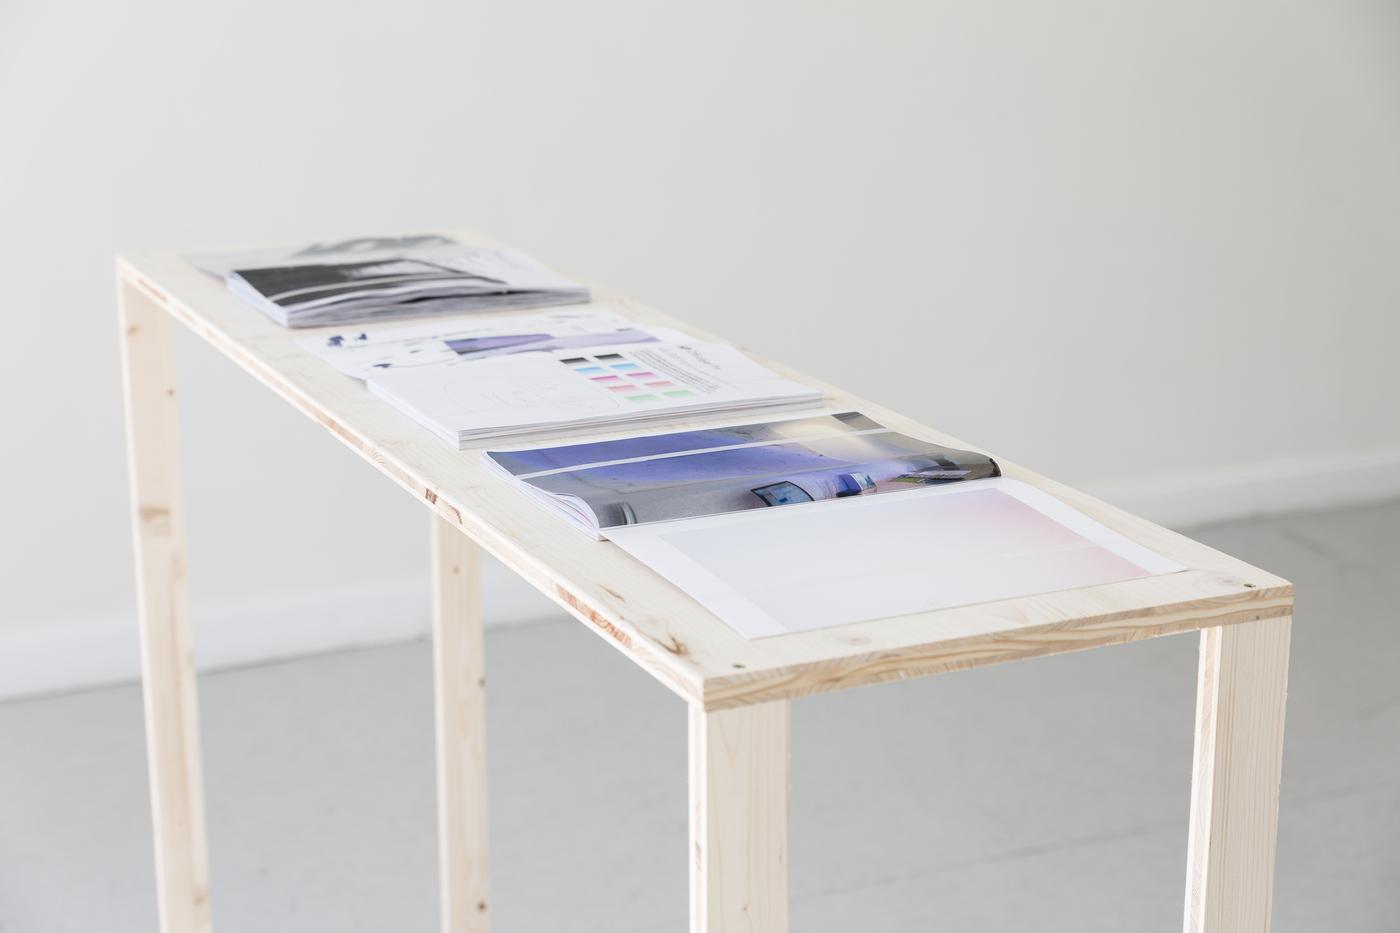 13_Heike-Karin_Föll_n°155_office_drag_pro_2016_Installation_View_ToLieInTheCheeseToSmileInTheButter_KUNSTSAELEBerlin_2016_photo-Frank_Sperling